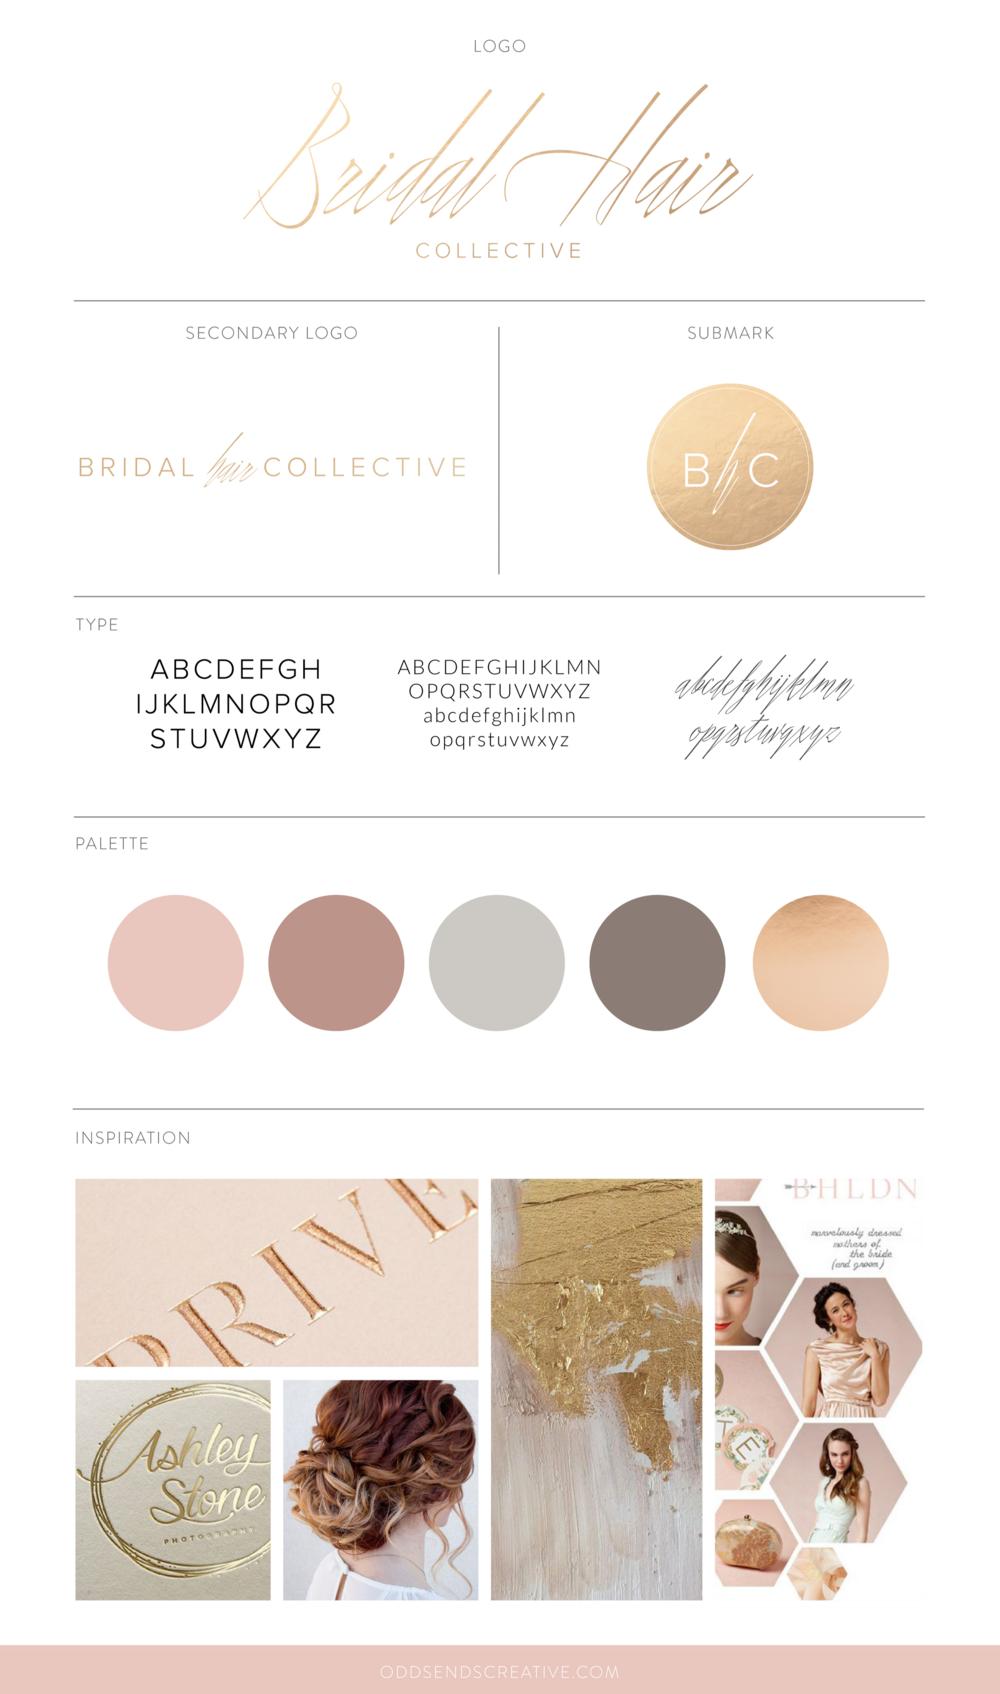 brand-designer-creative-entrepreneur-blush